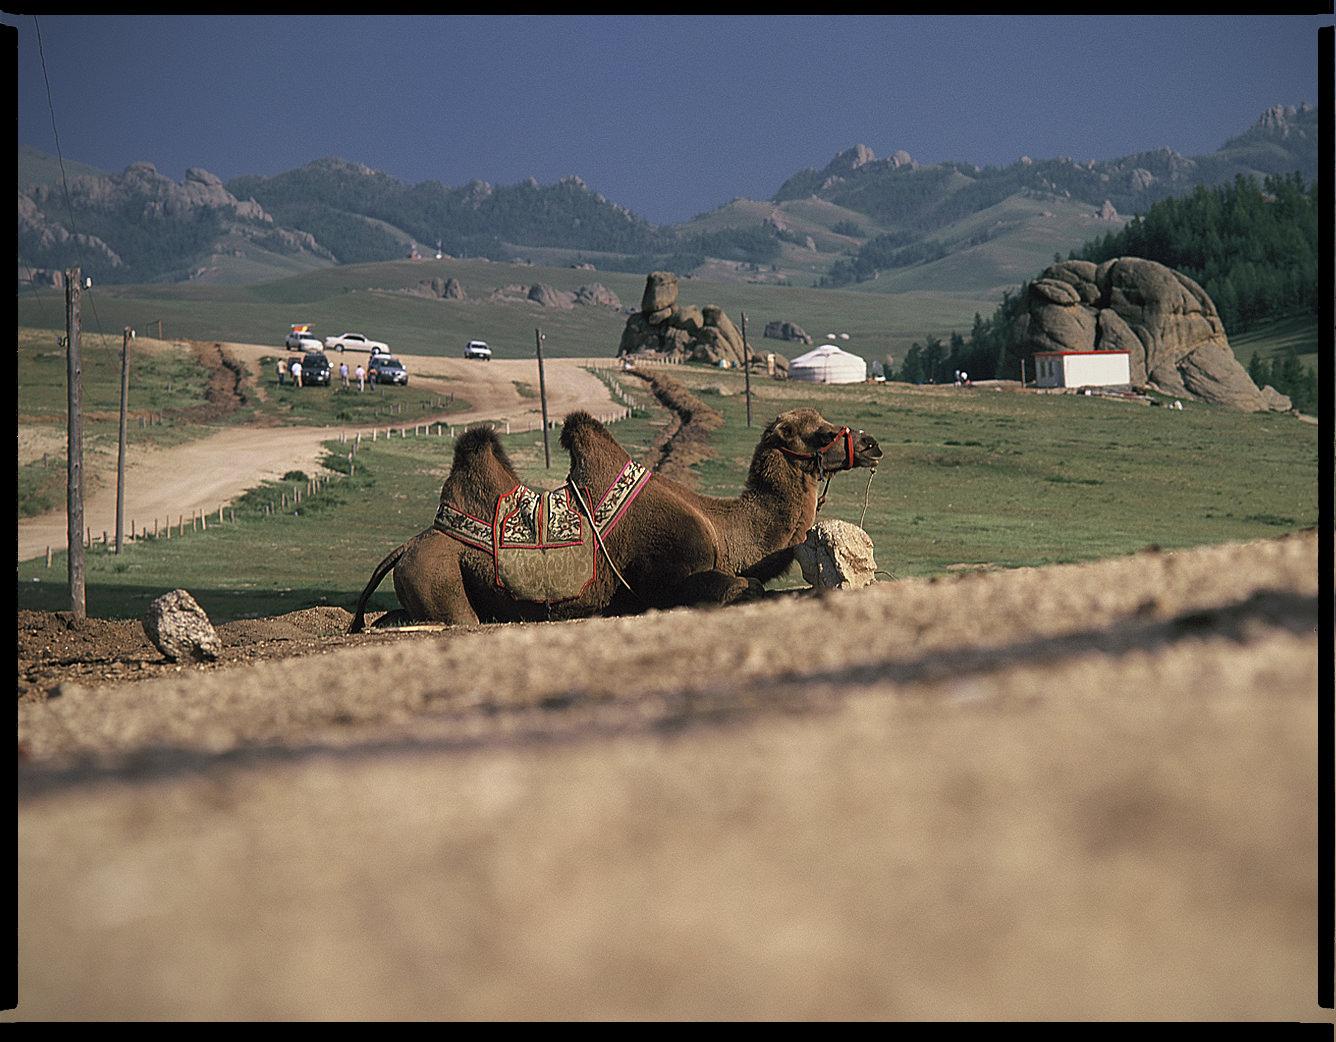 MediumFormatPatrikWallner_Mongolia_CamelLOWQ-1